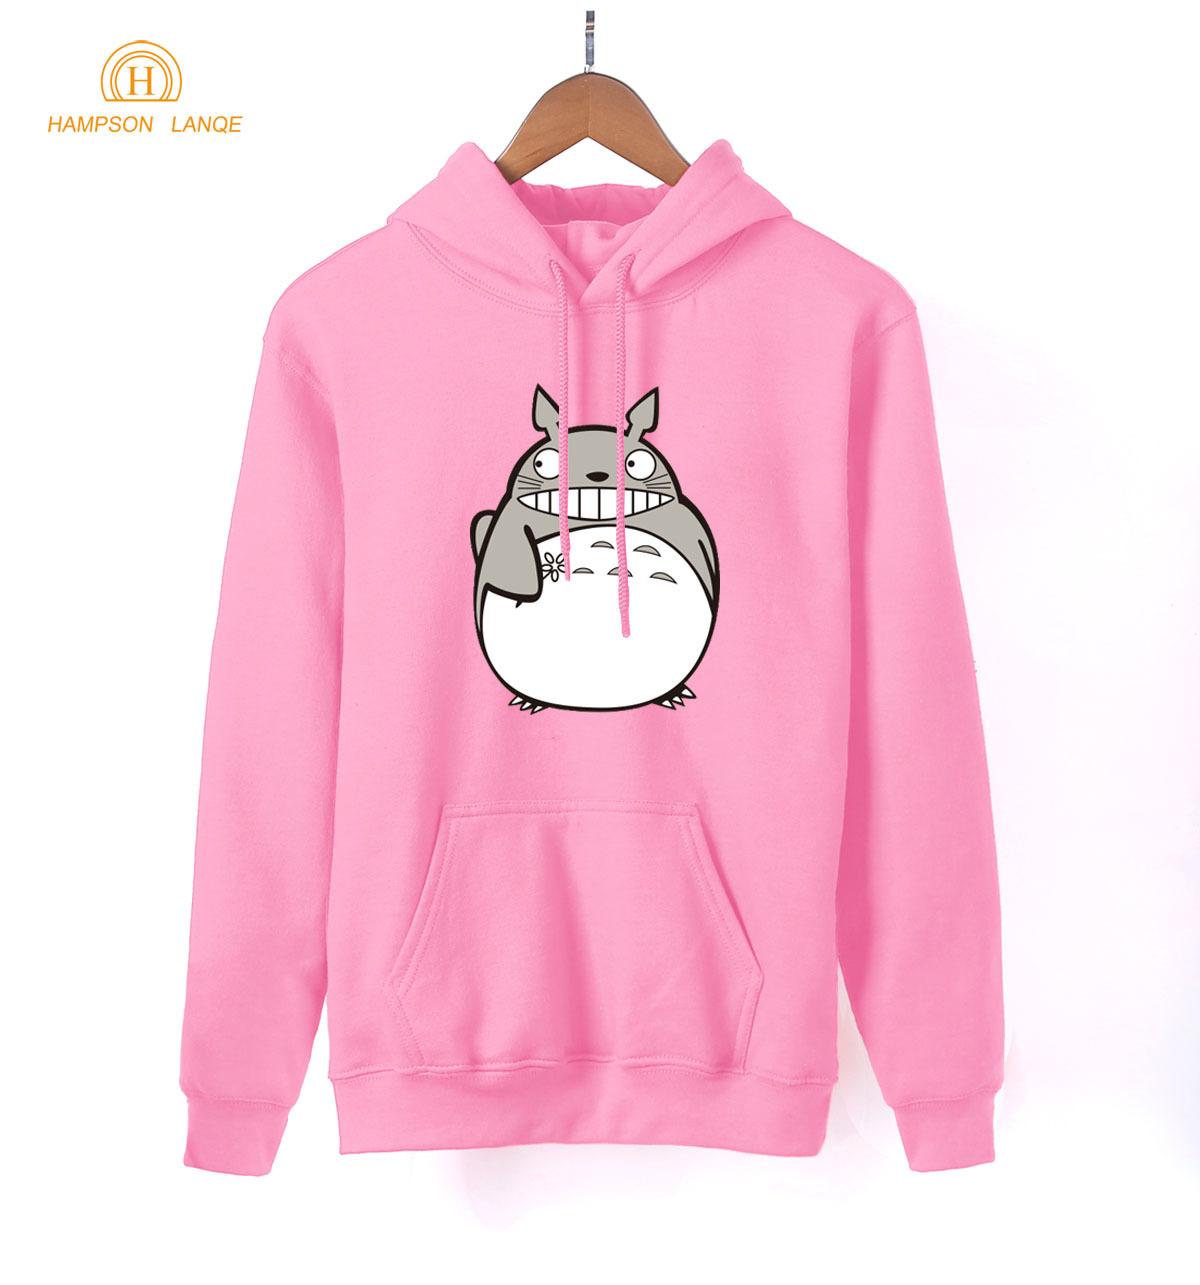 Japan Anime Kawaii Totoro Print Anime Hoodies 2019 Spring Autumn Harajuku Sweatshirts Women Hoodies Pink Warm Long Sleeve Hooded